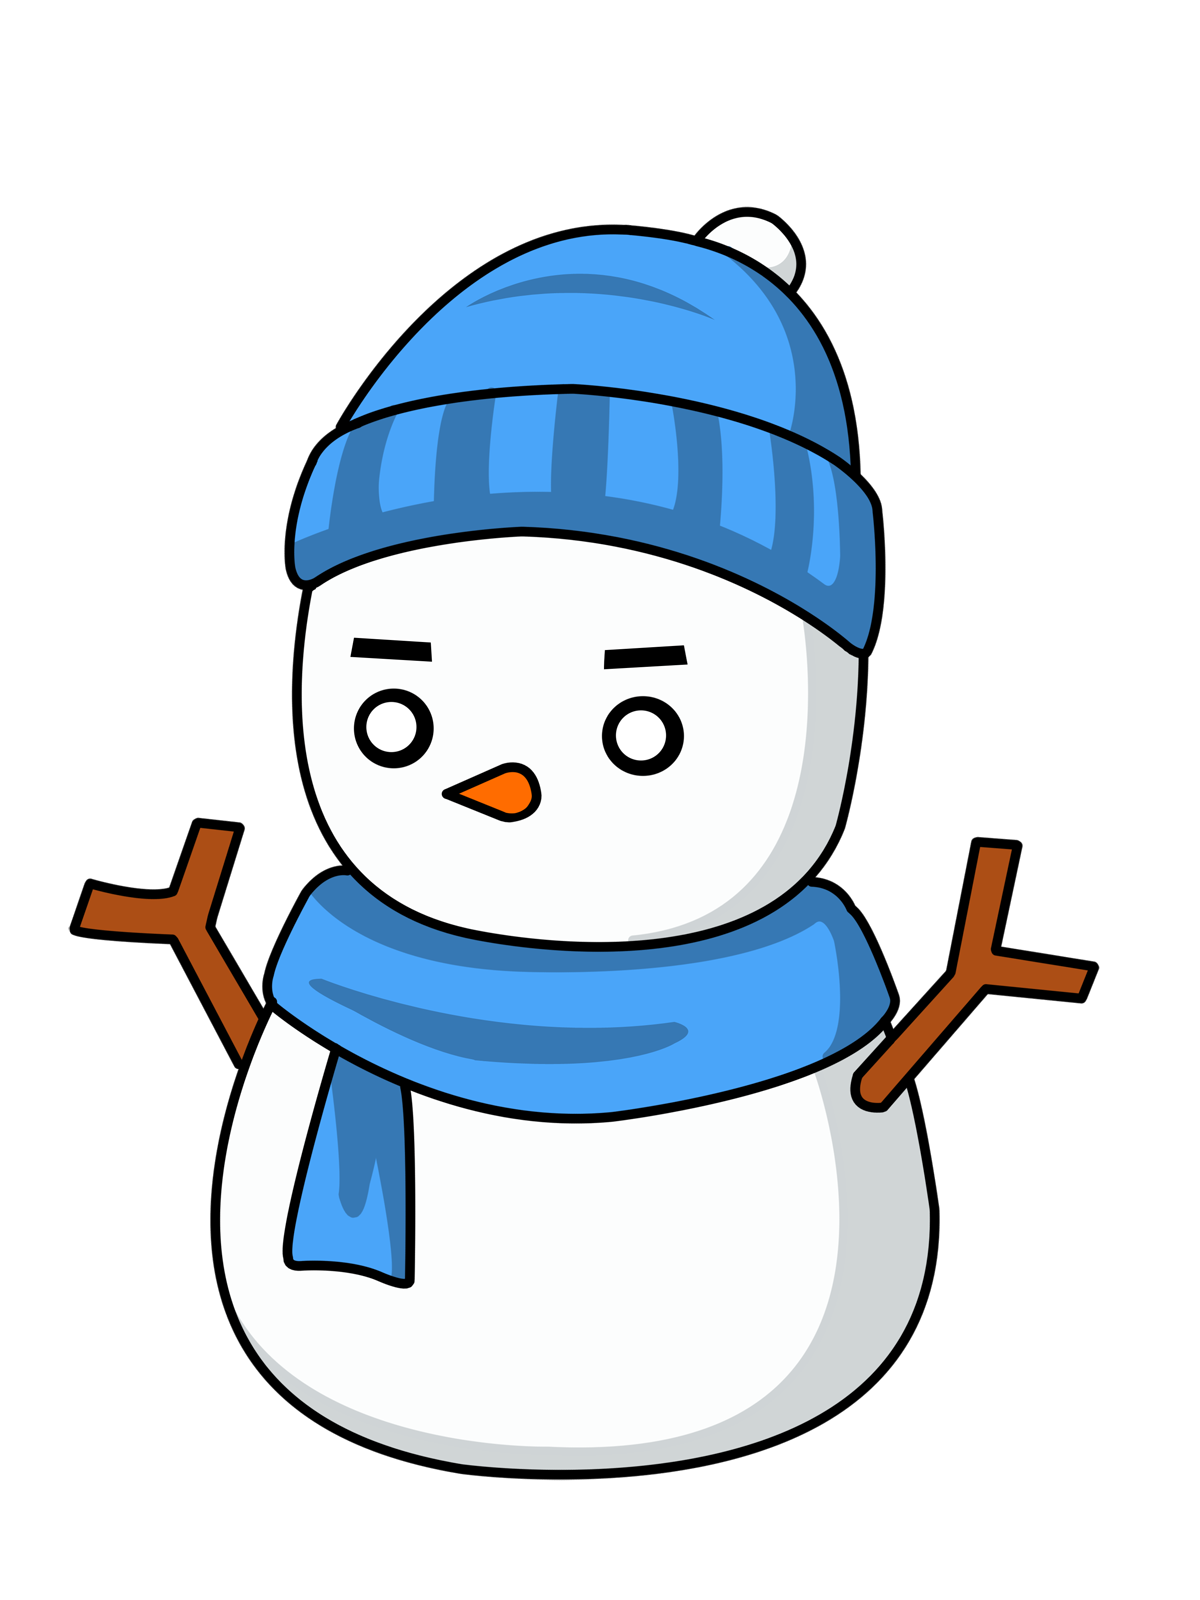 Snowman Top Hat Clipart | Clipart Panda - Free Clipart Images